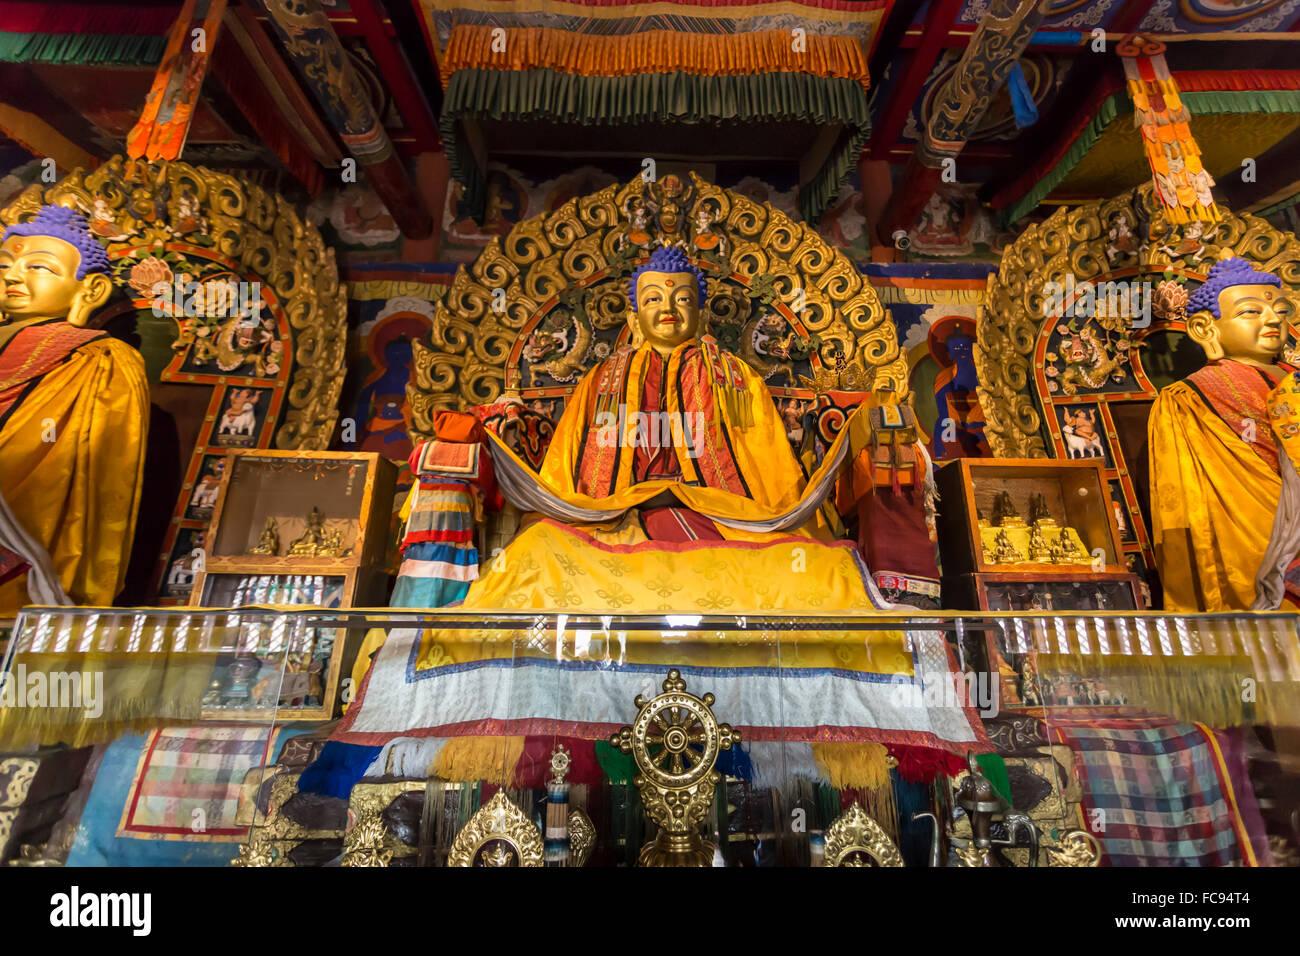 Golden Buddha statues and display items, Baruun Zuu temple, Erdene Zuu Khiid, Monastery, Kharkhorin (Karakorum), - Stock Image